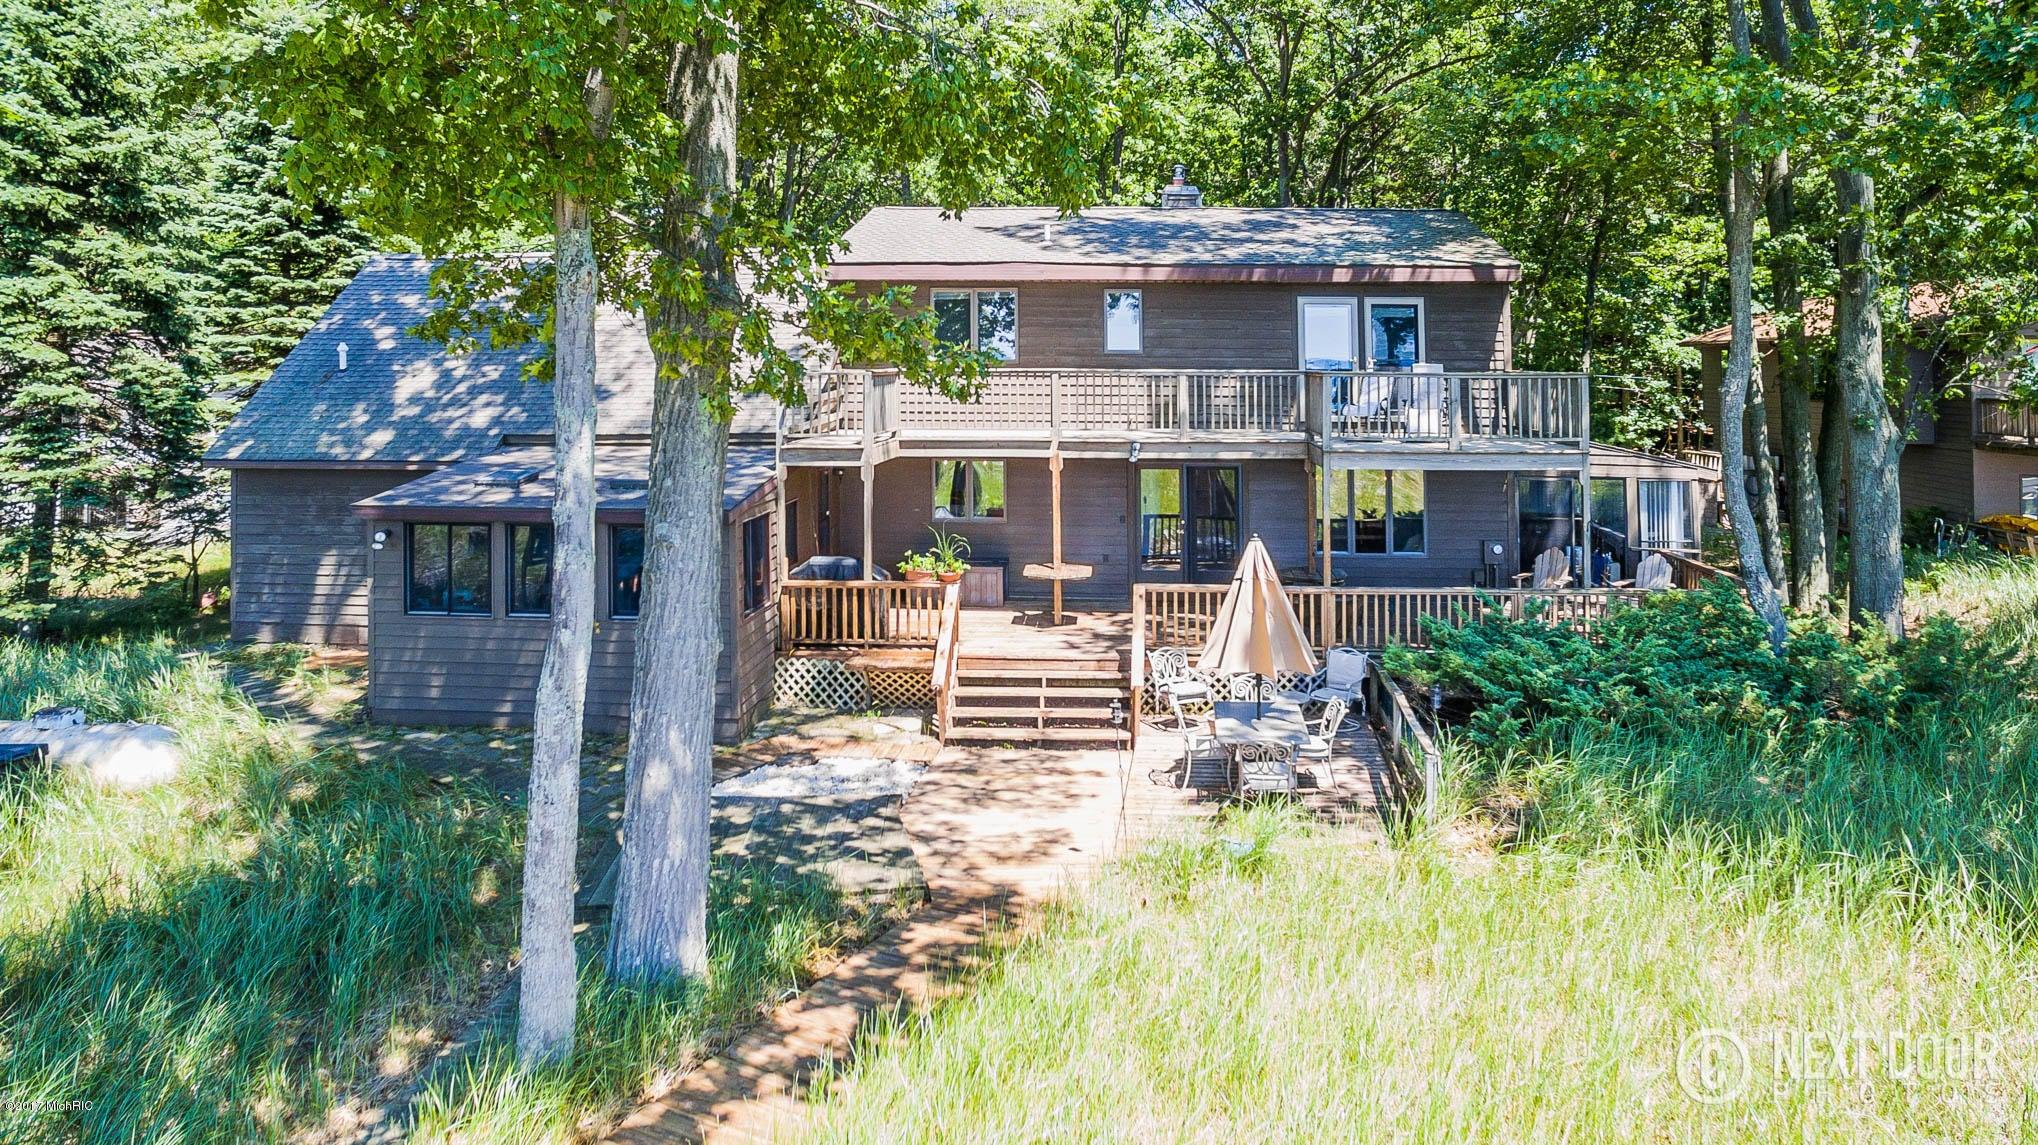 Single Family Home for Sale at 3501 Winnetaska 3501 Winnetaska Norton Shores, Michigan 49441 United States